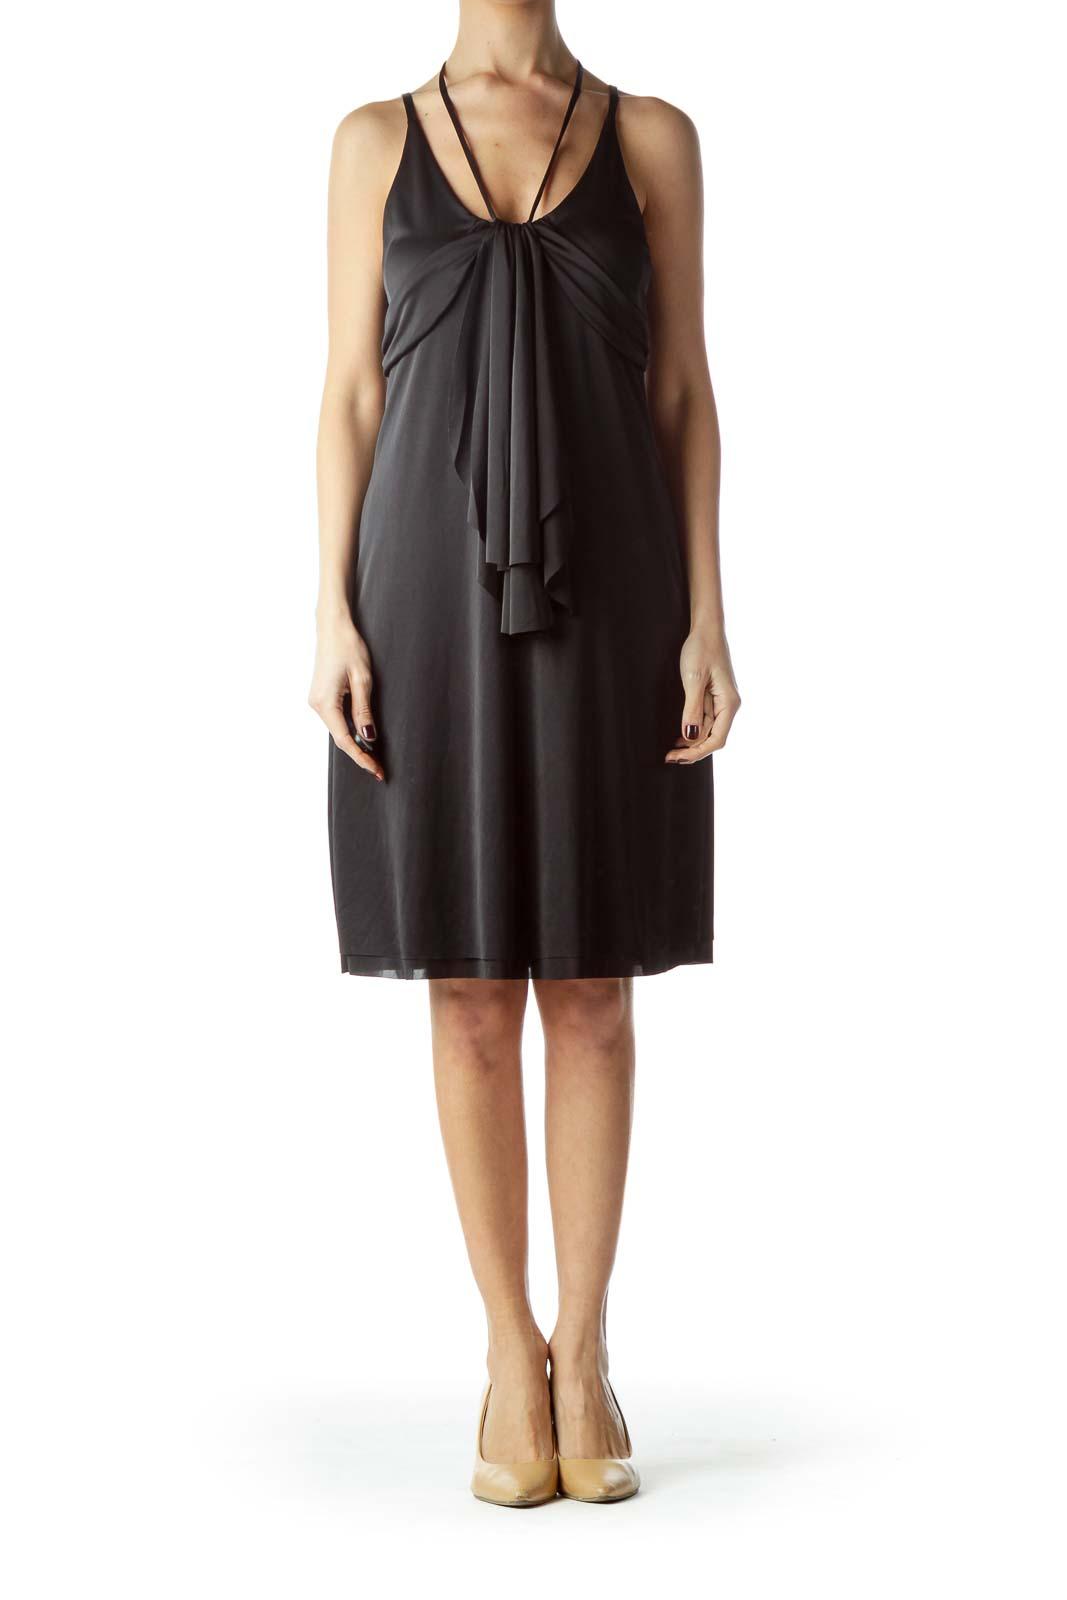 Black Adjustable Straps Shift Shiny Dress